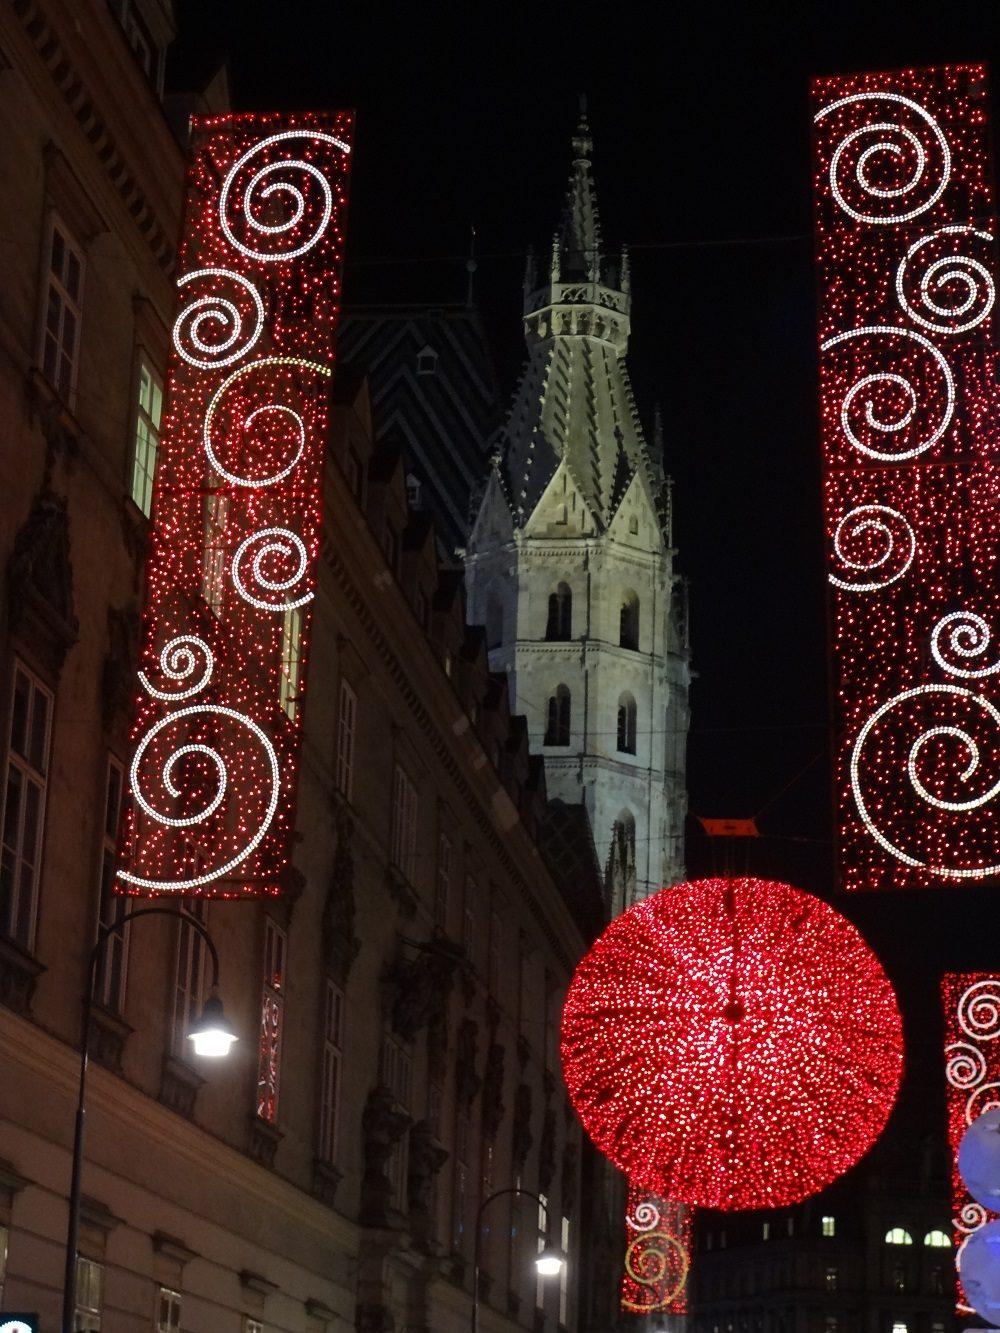 Weihnachtsbeleuchtung-Wien Rotensturmstraße Heidenturm